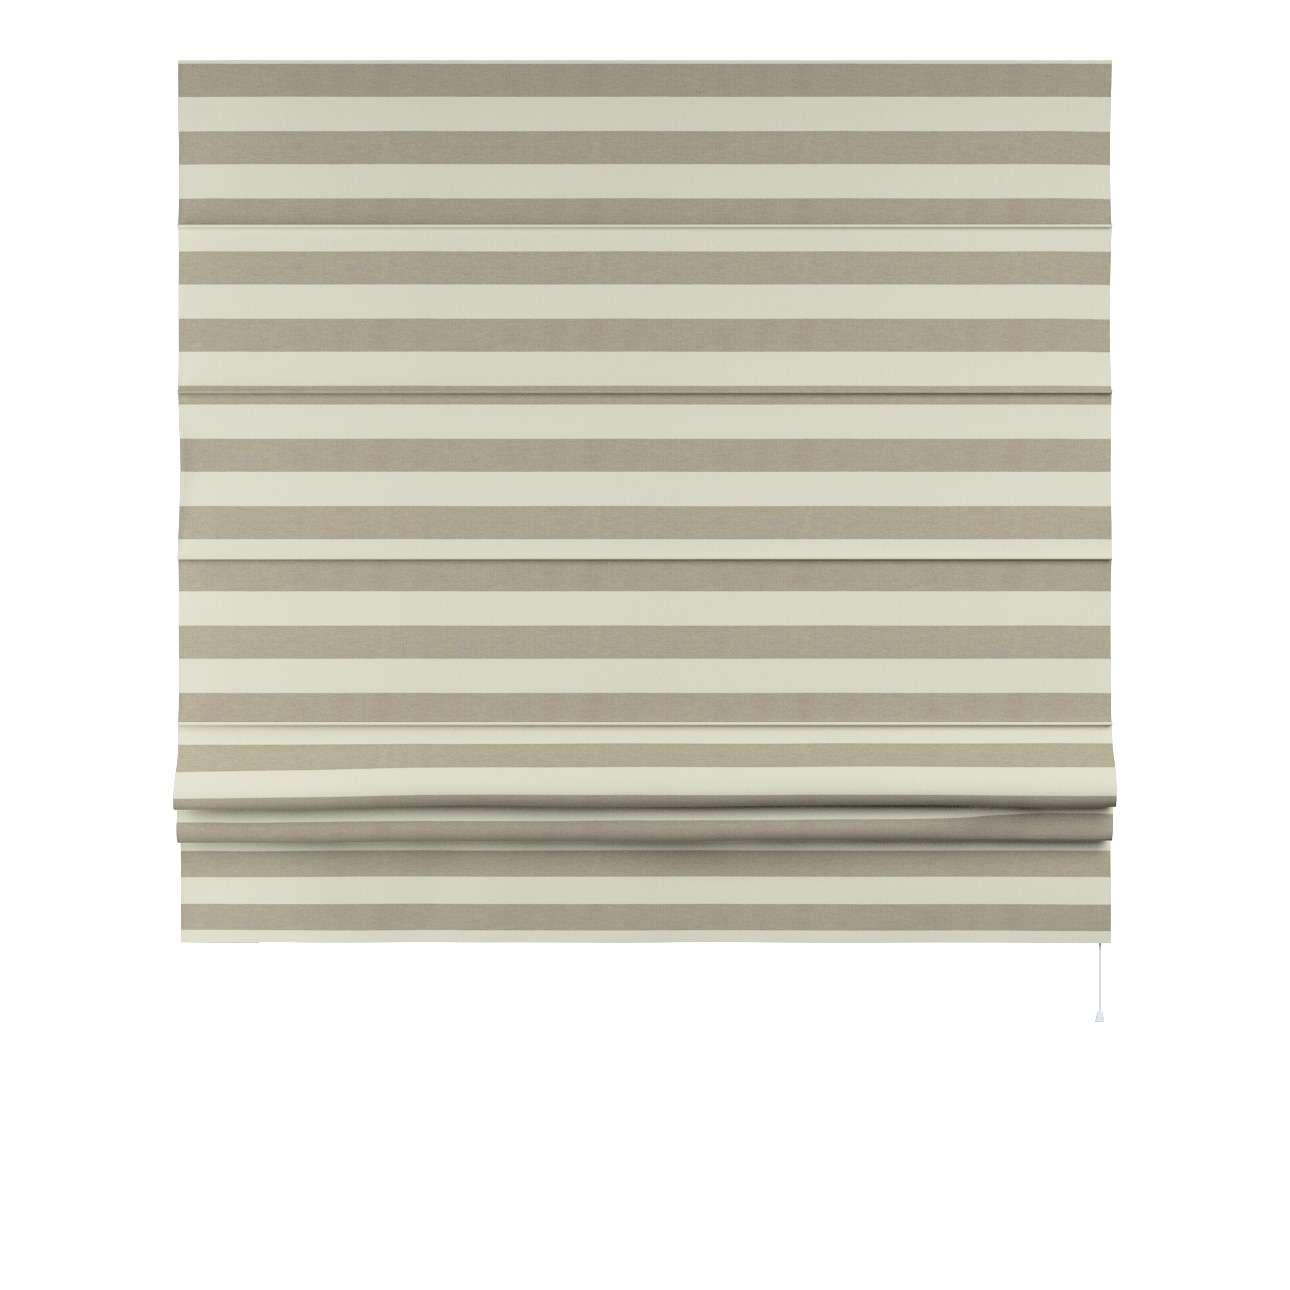 Rímska roleta Padva V kolekcii Quadro, tkanina: 142-73